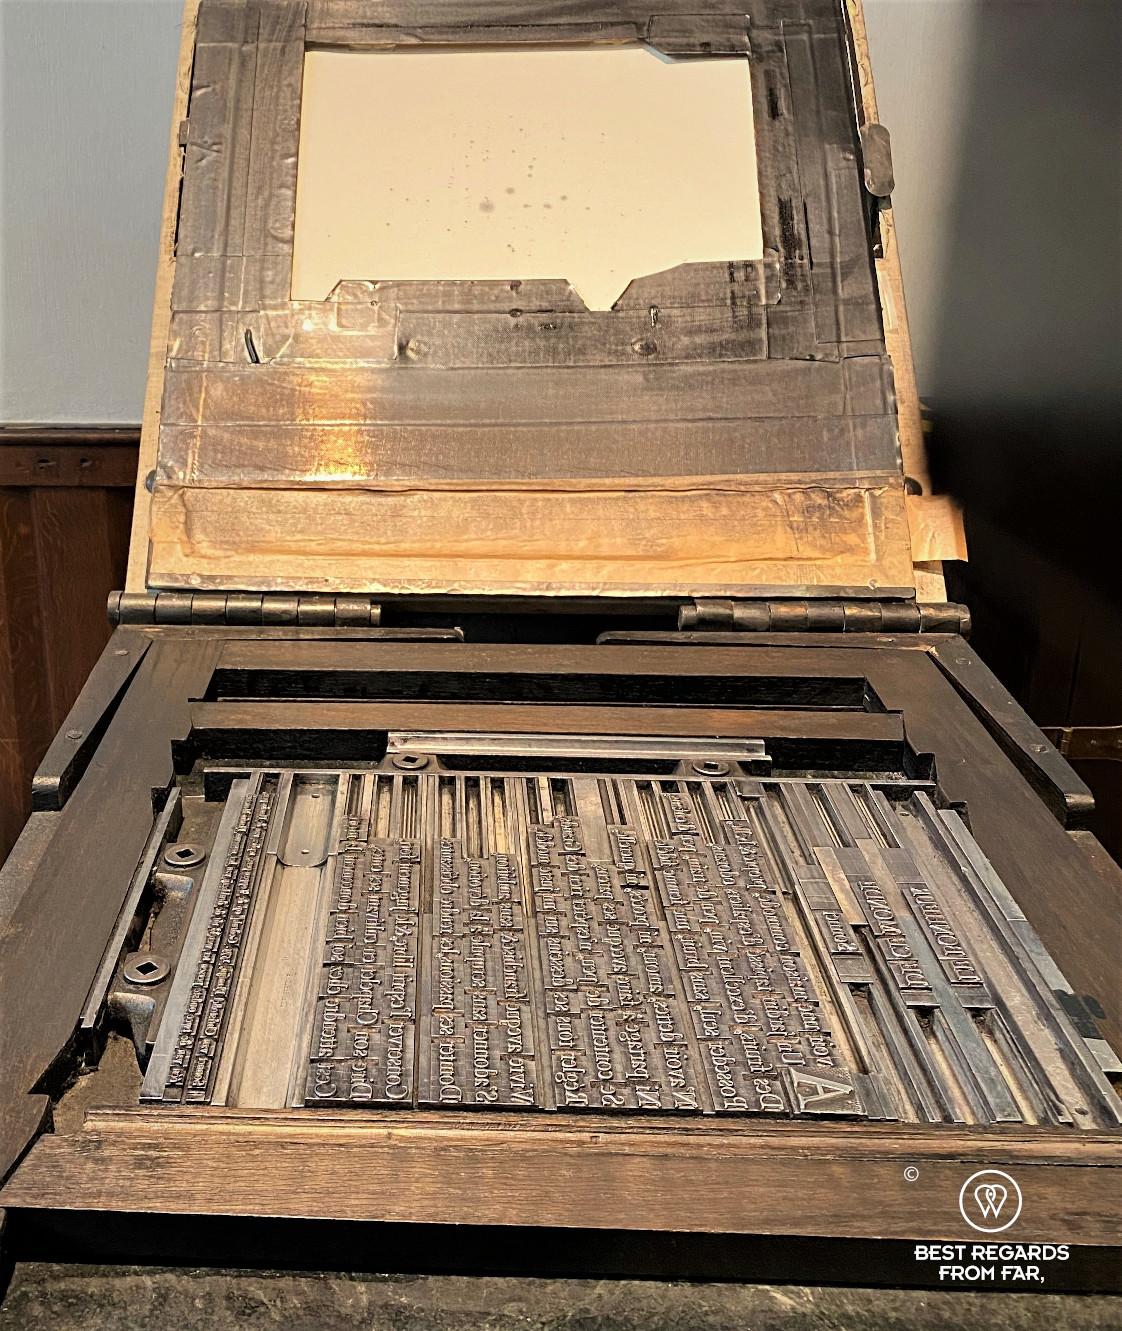 Old printing press at the Plantin Moretus Museum, Antwerp